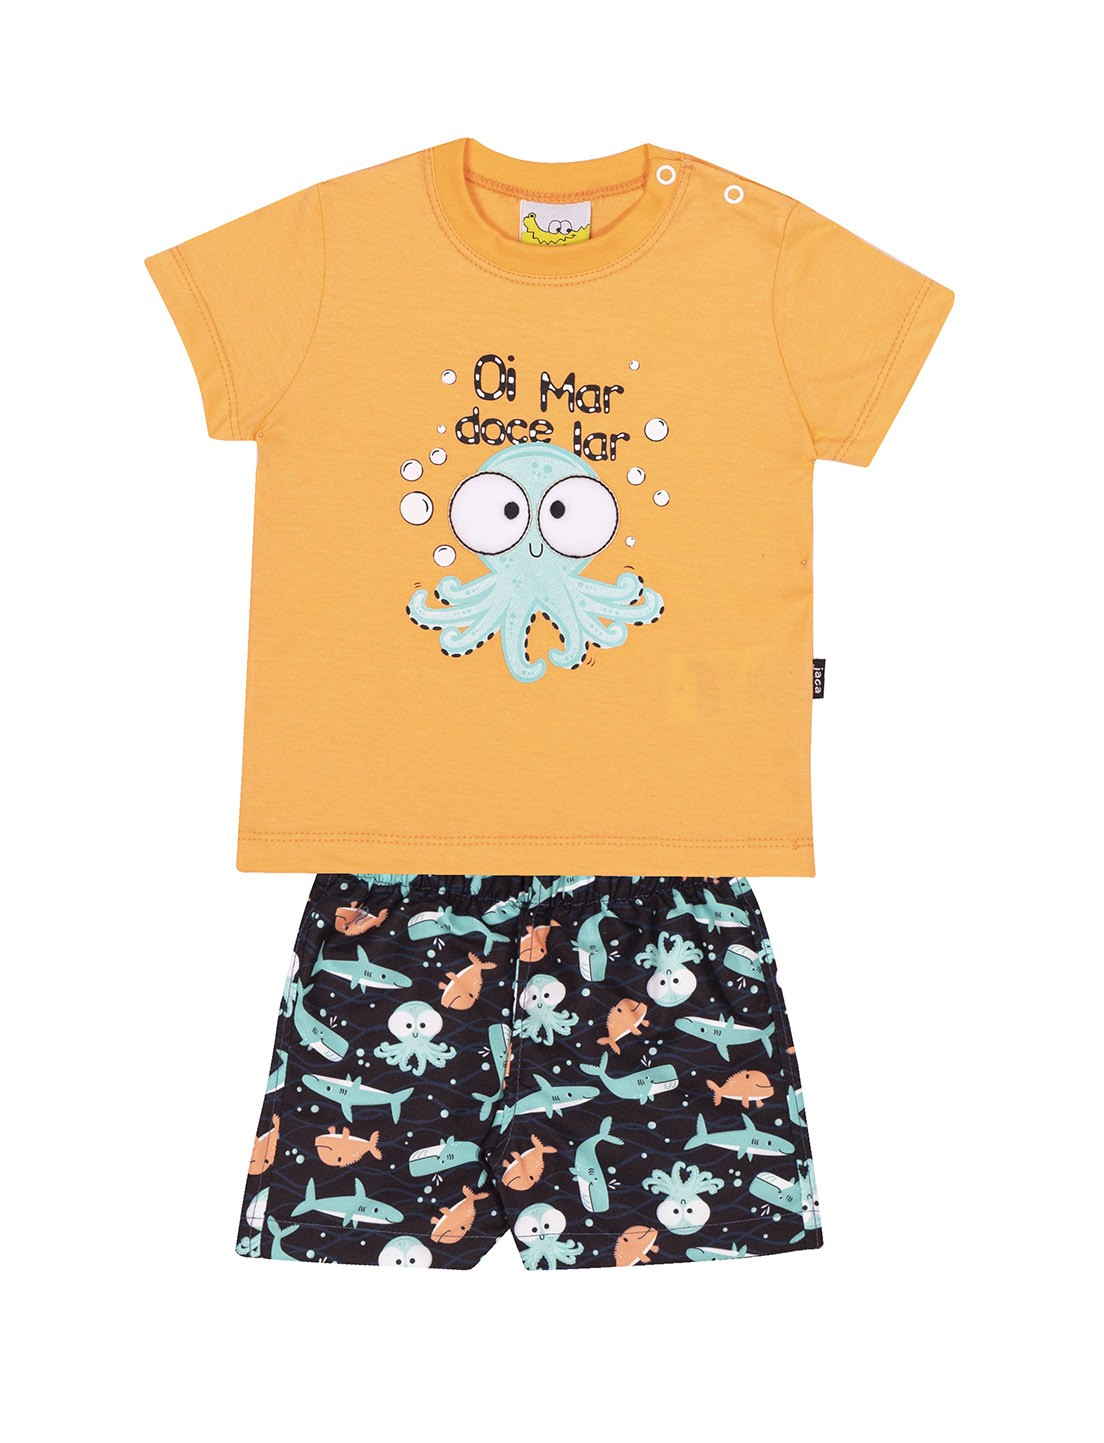 Conjunto Infantil Camiseta e Shorts JACA-LELÉ Polvo Laranja e Preto